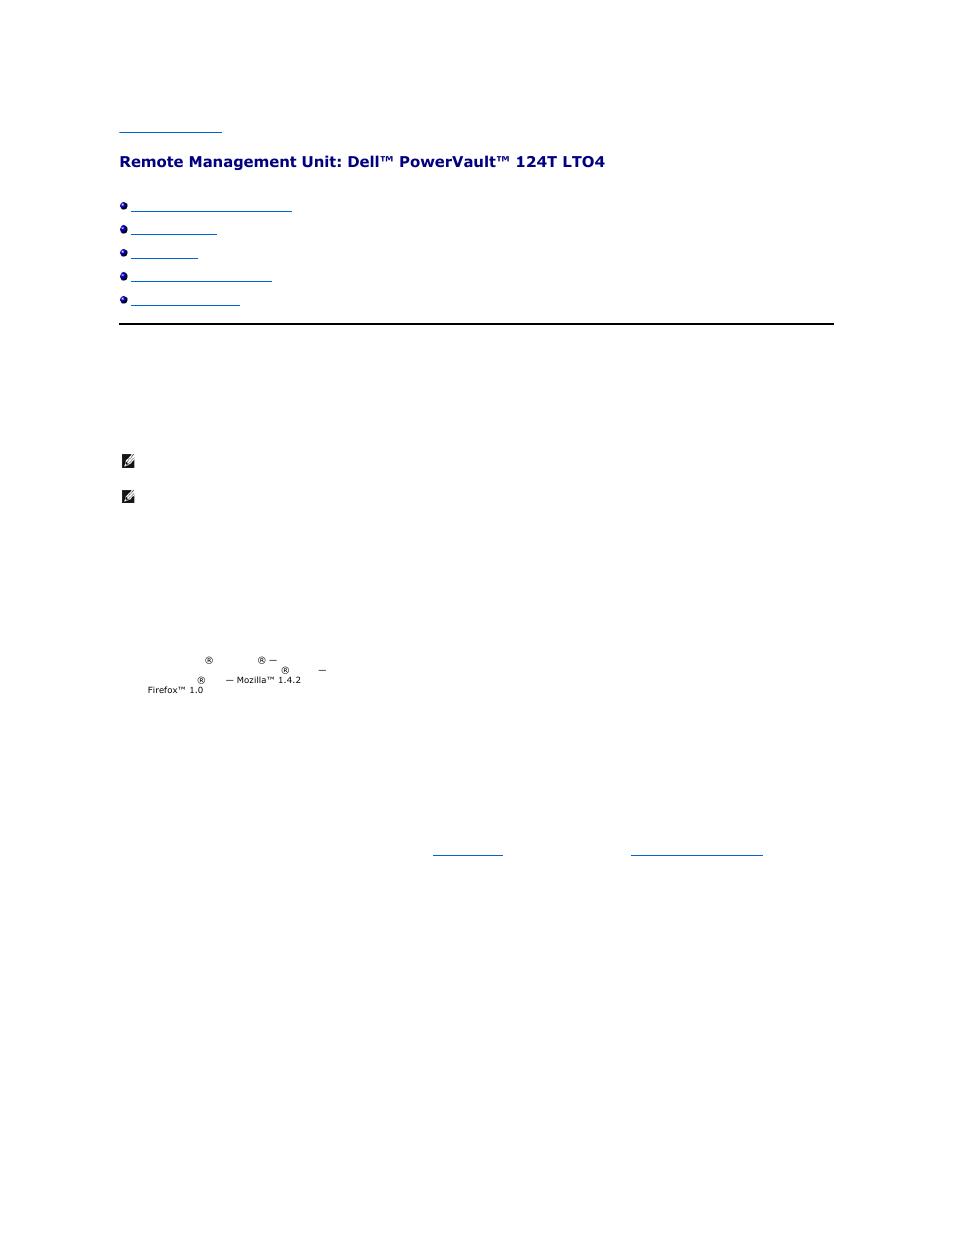 Remote management unit overview | Dell PowerVault 124T User